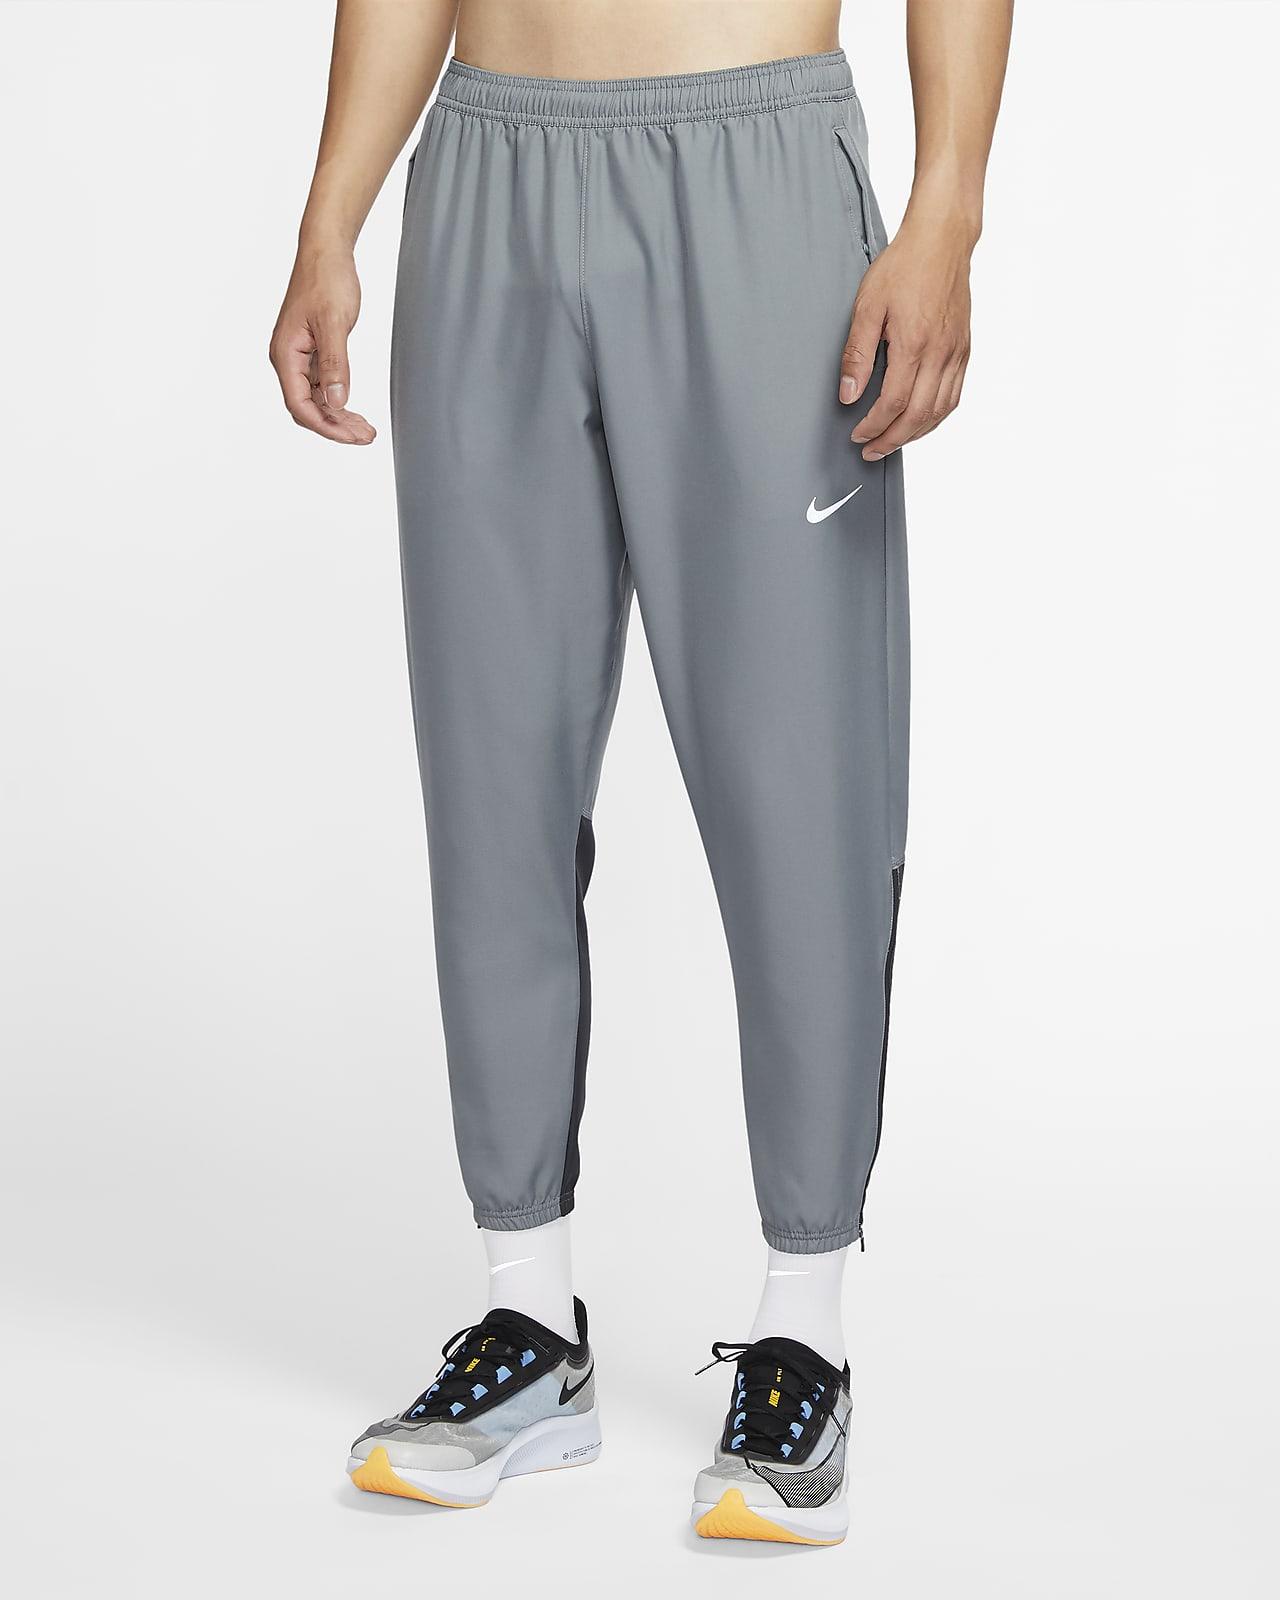 Pantaloni da running woven Nike Essential - Uomo